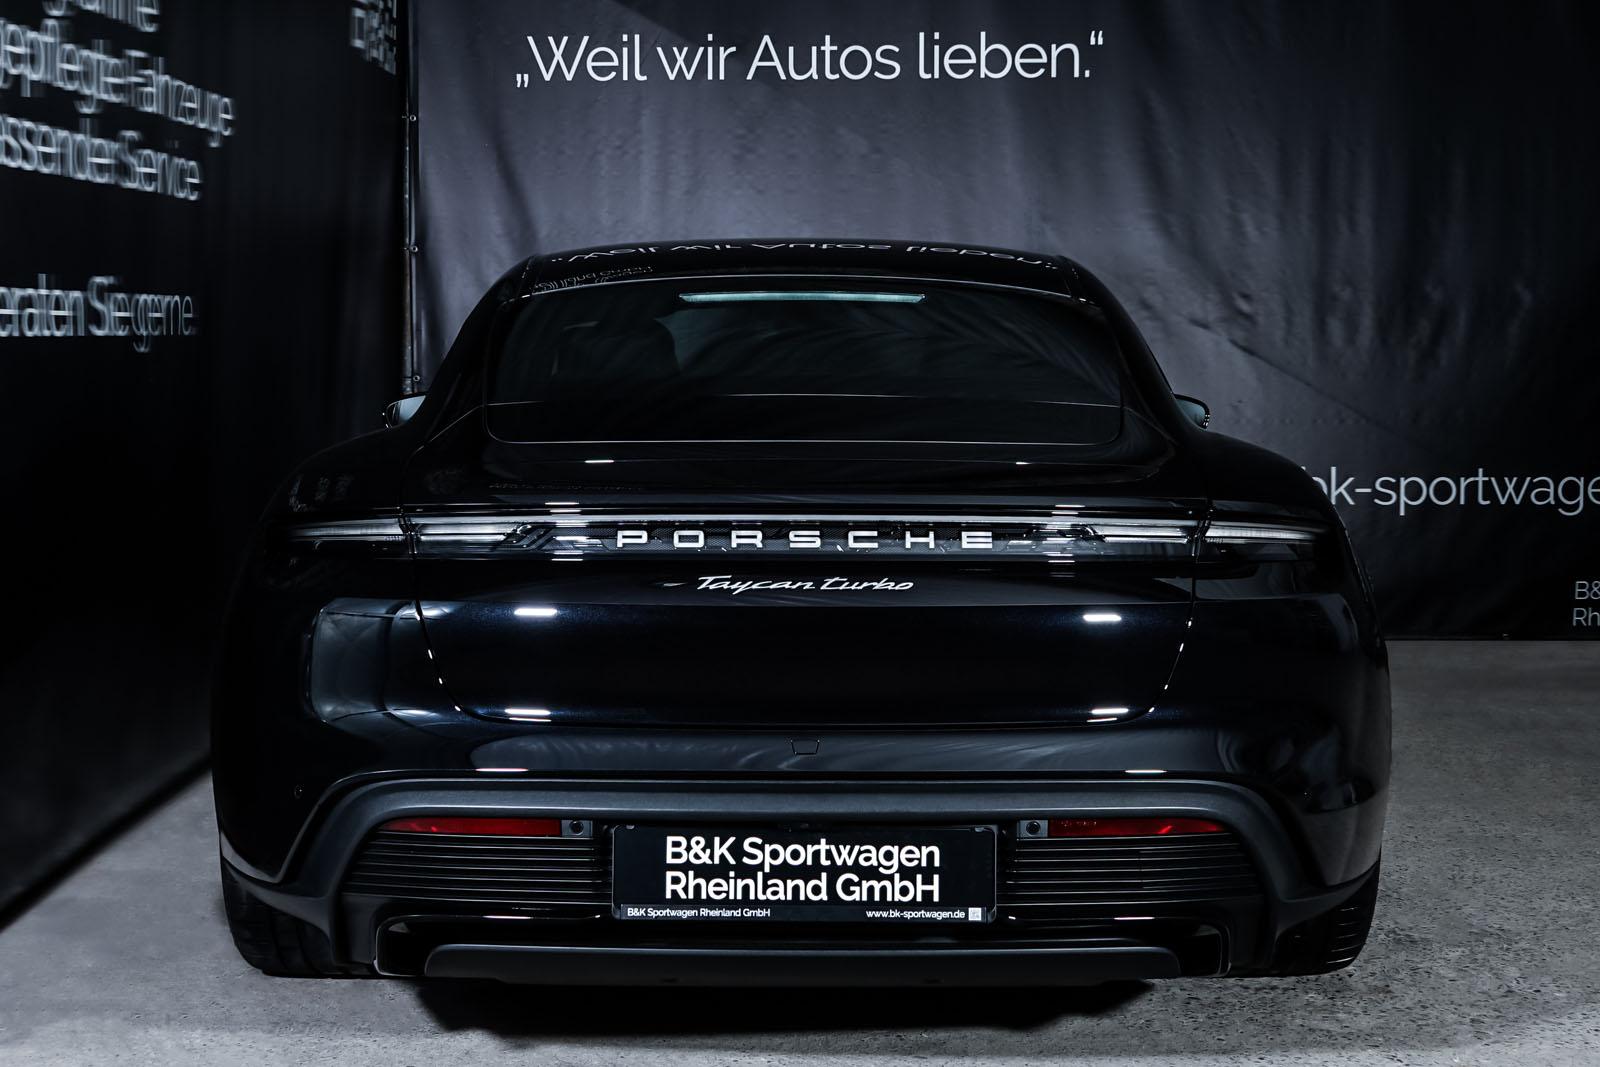 Porsche_Taycan_Turbo_Schwarz_Schwarz_POR-8106_15_w